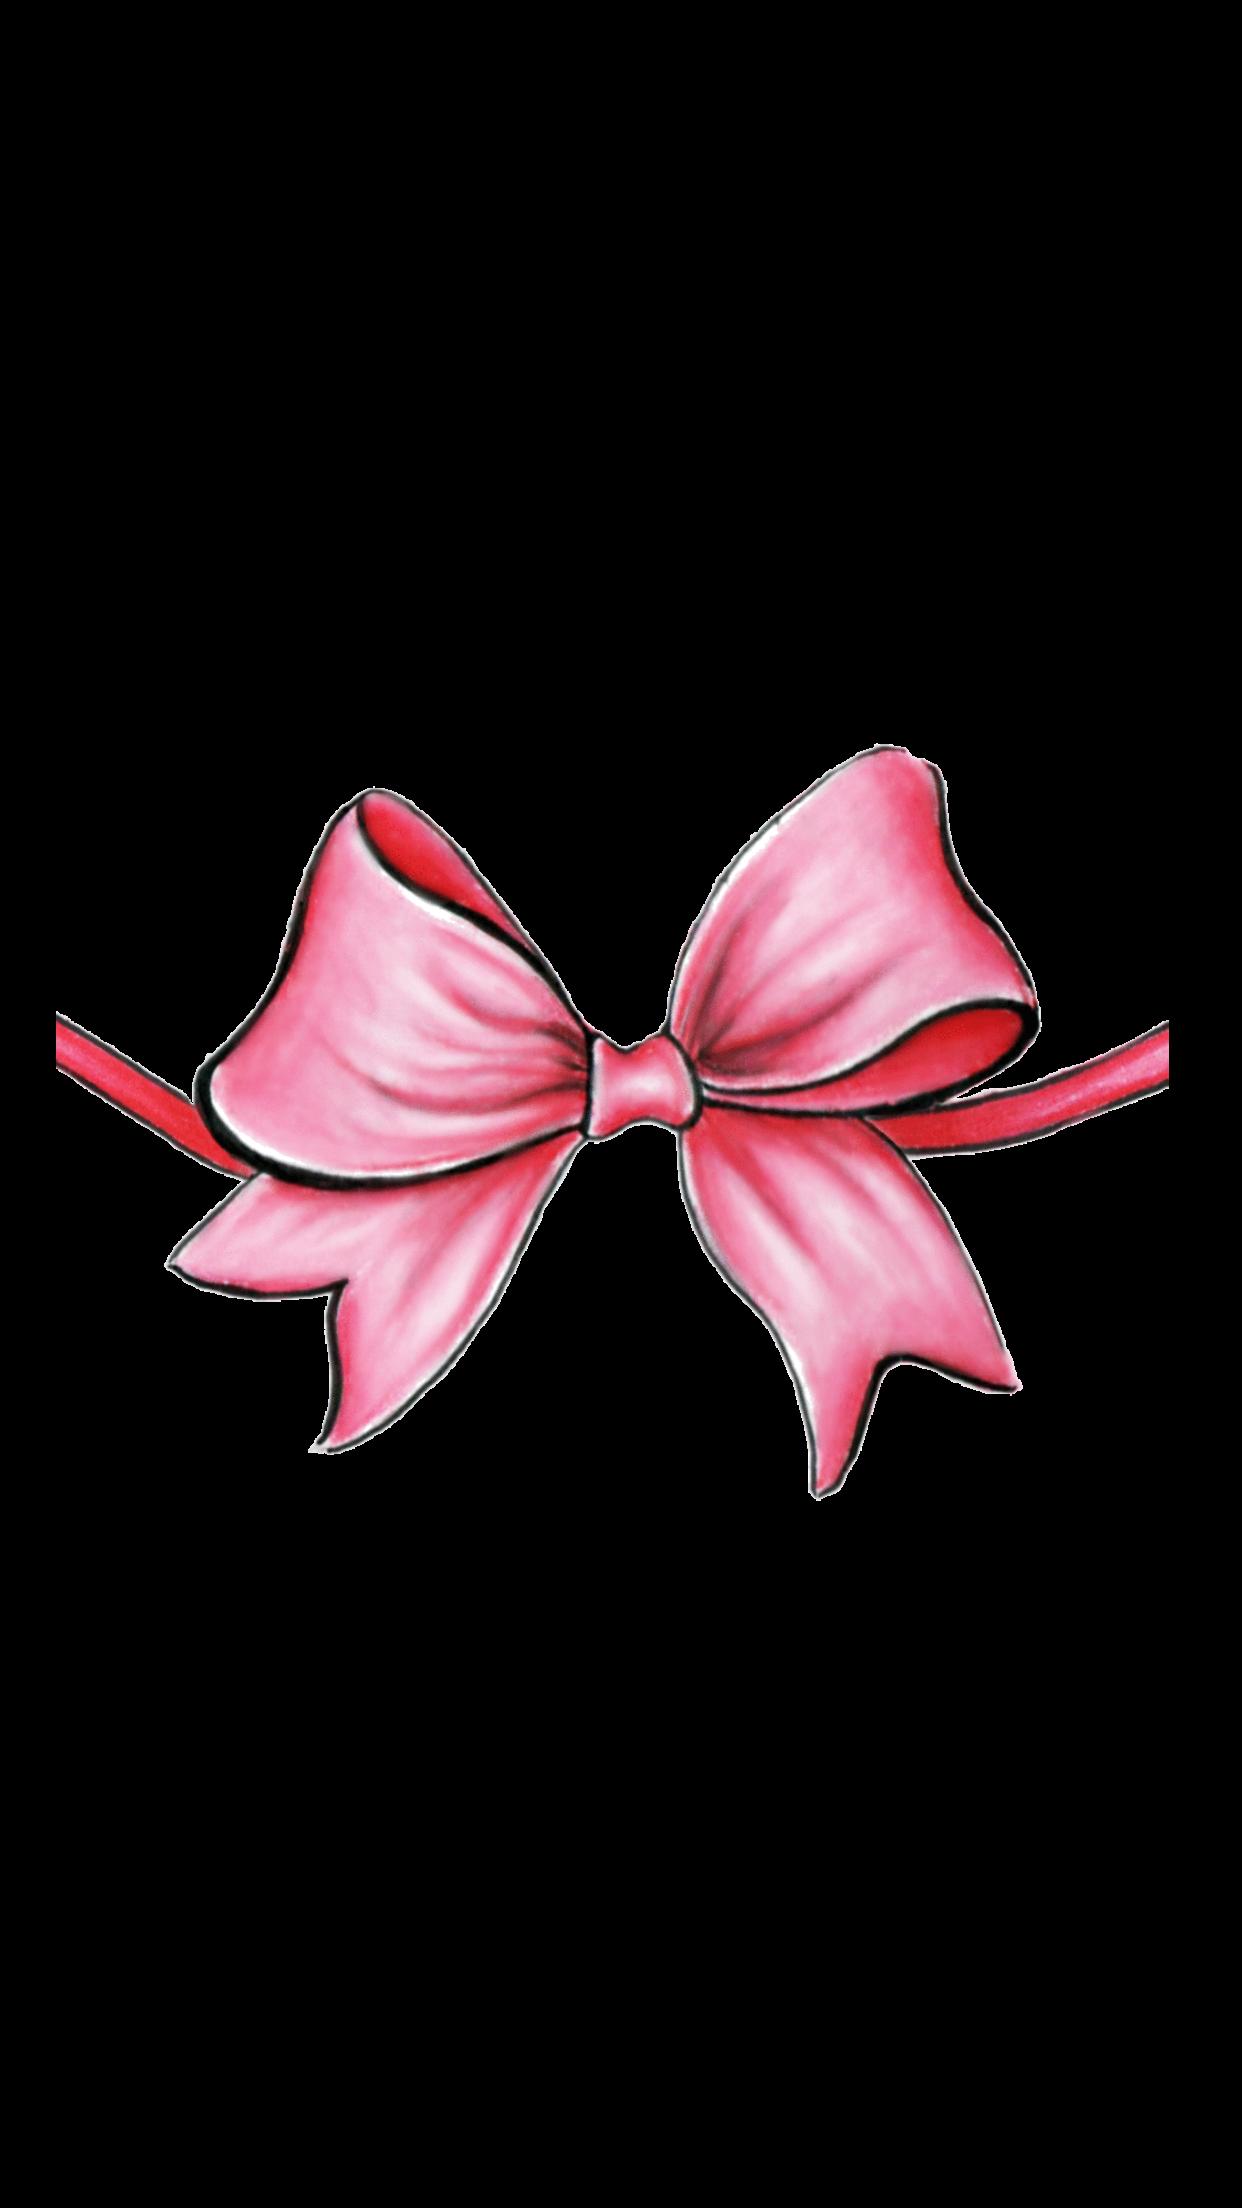 Pink Bow Casetify Iphone Art Design Ribbon Illustration Ribbon Bows Pink Ribbon Pink